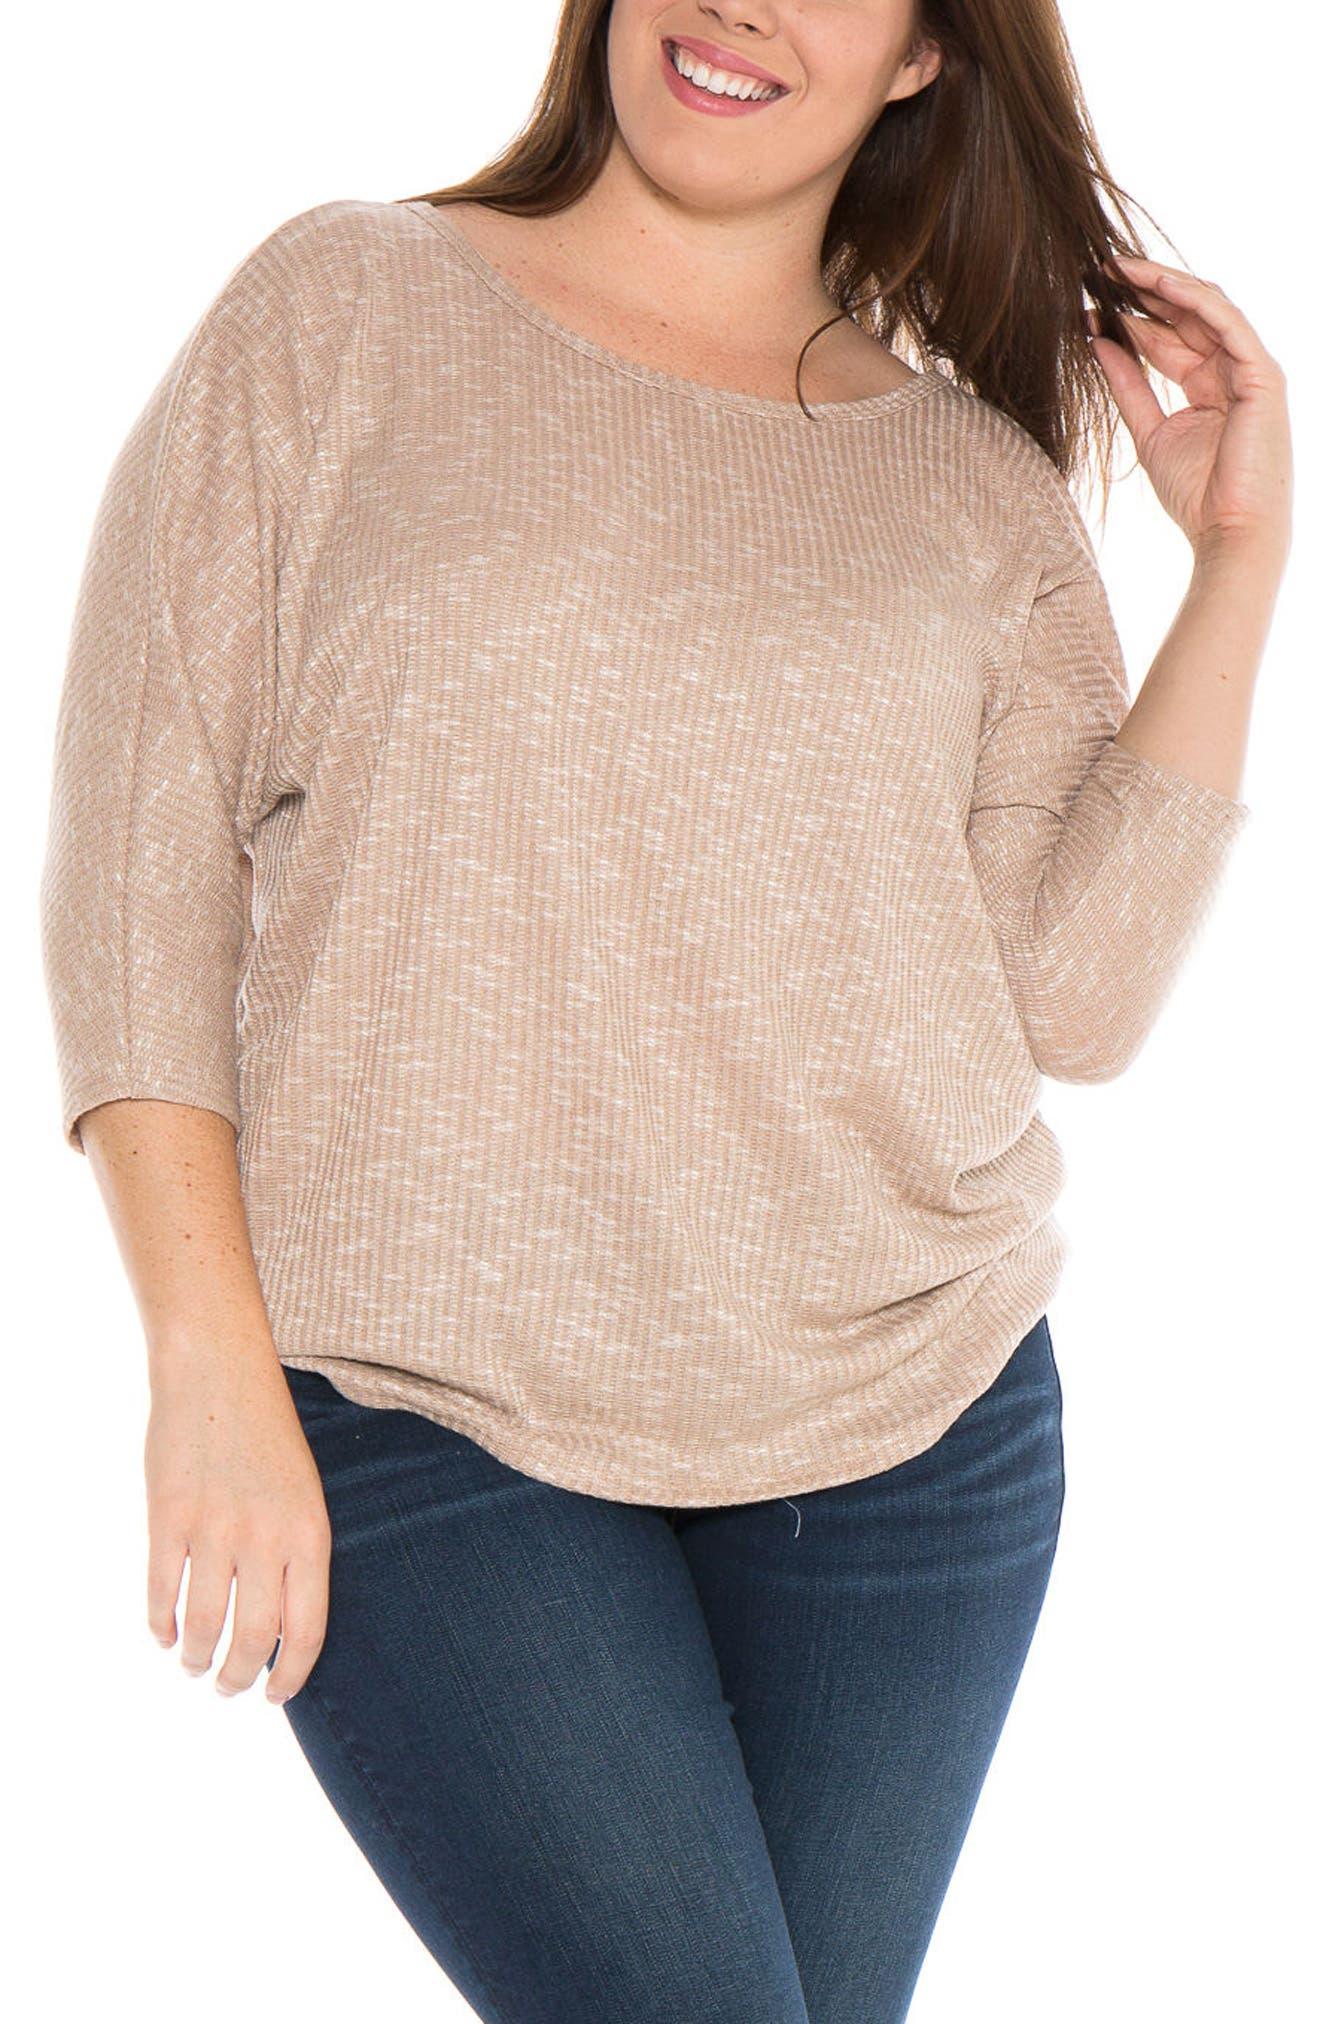 Main Image - SLINK Jeans Marble Knit Dolman Top (Plus Size)